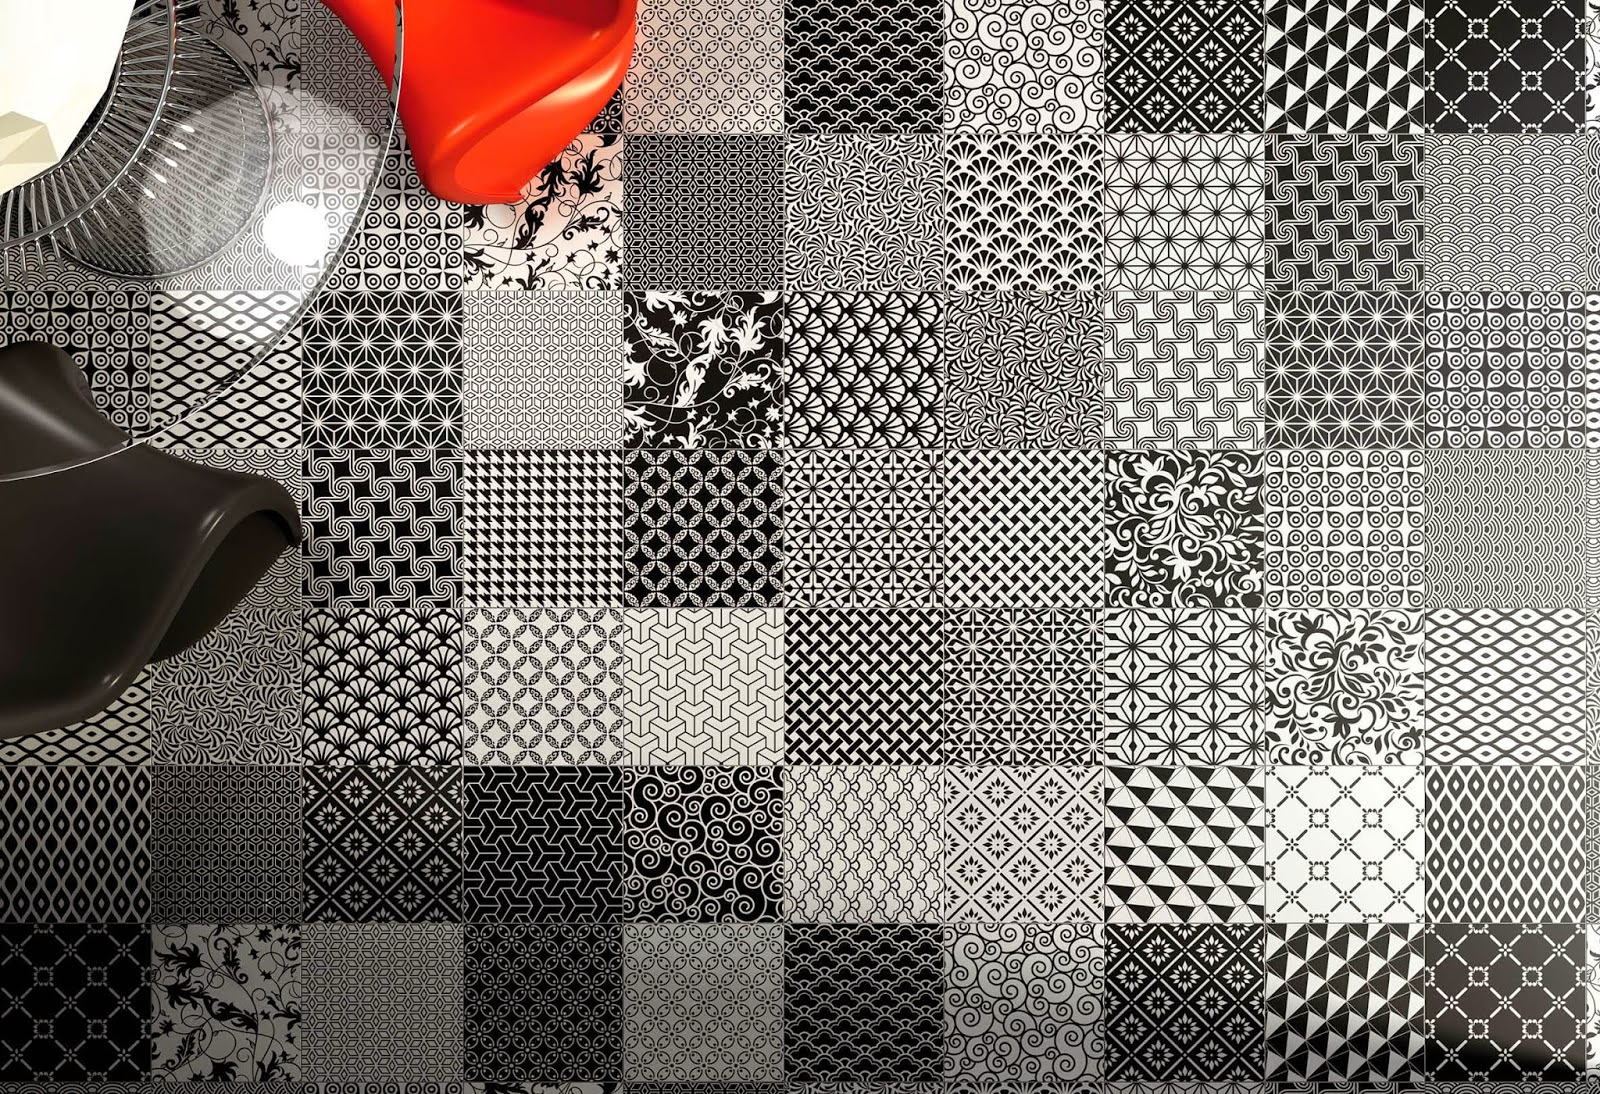 Avente Tile Talk: May 2014